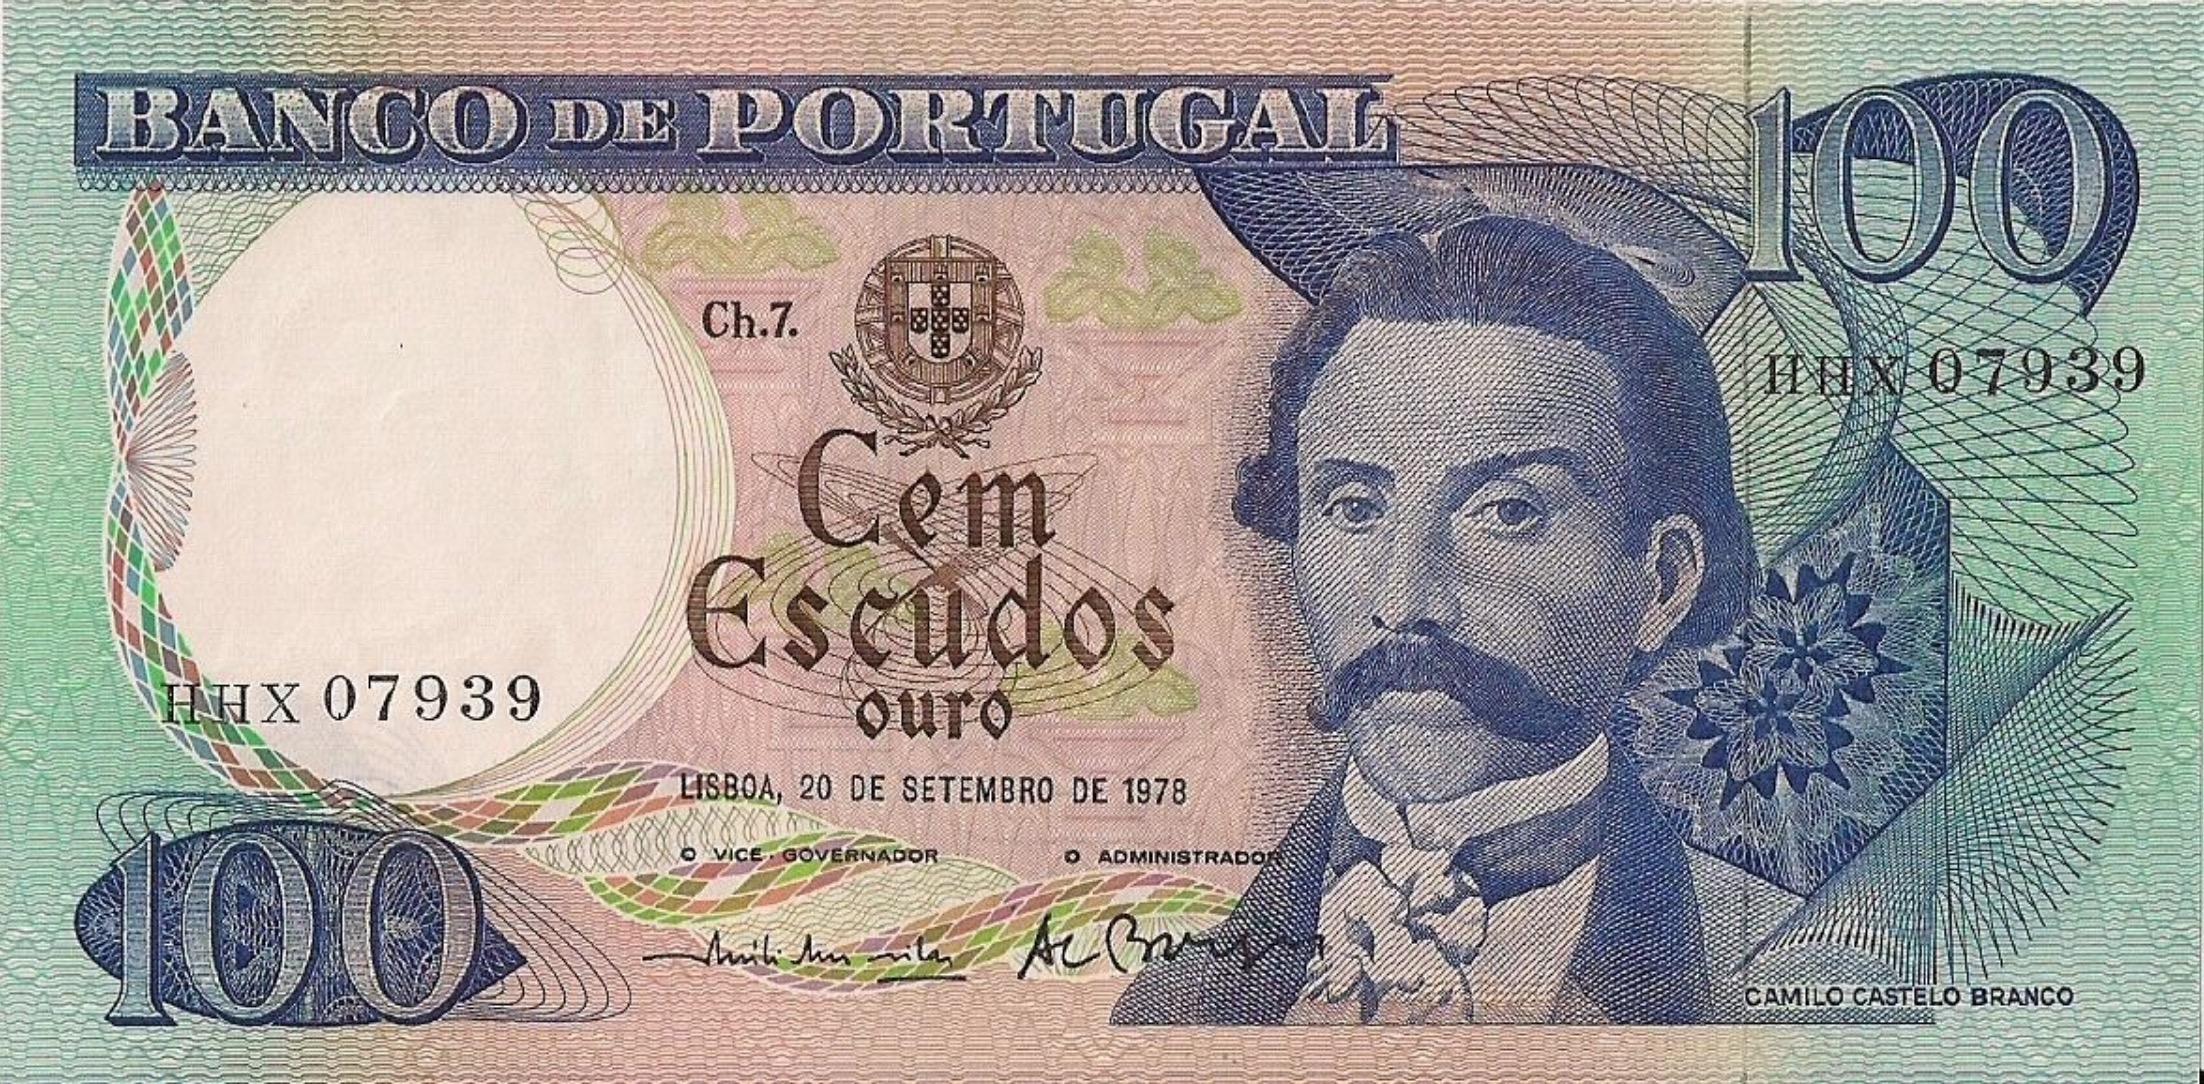 100 Portuguese Escudos banknote (Camilo Castelo Branco)